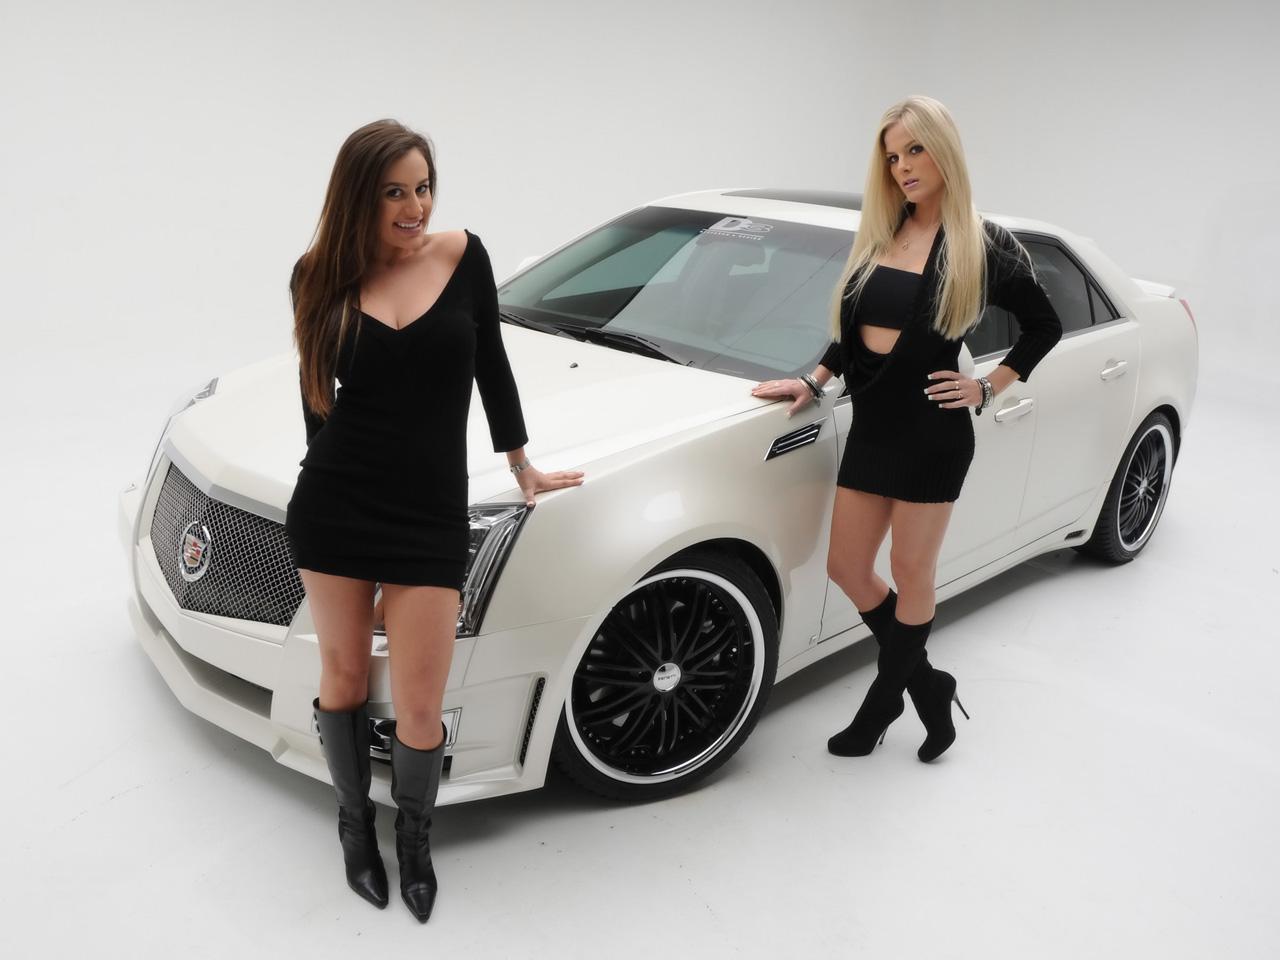 Ats Vs Cts >> D3 Cadillac CTS: merci les girls...